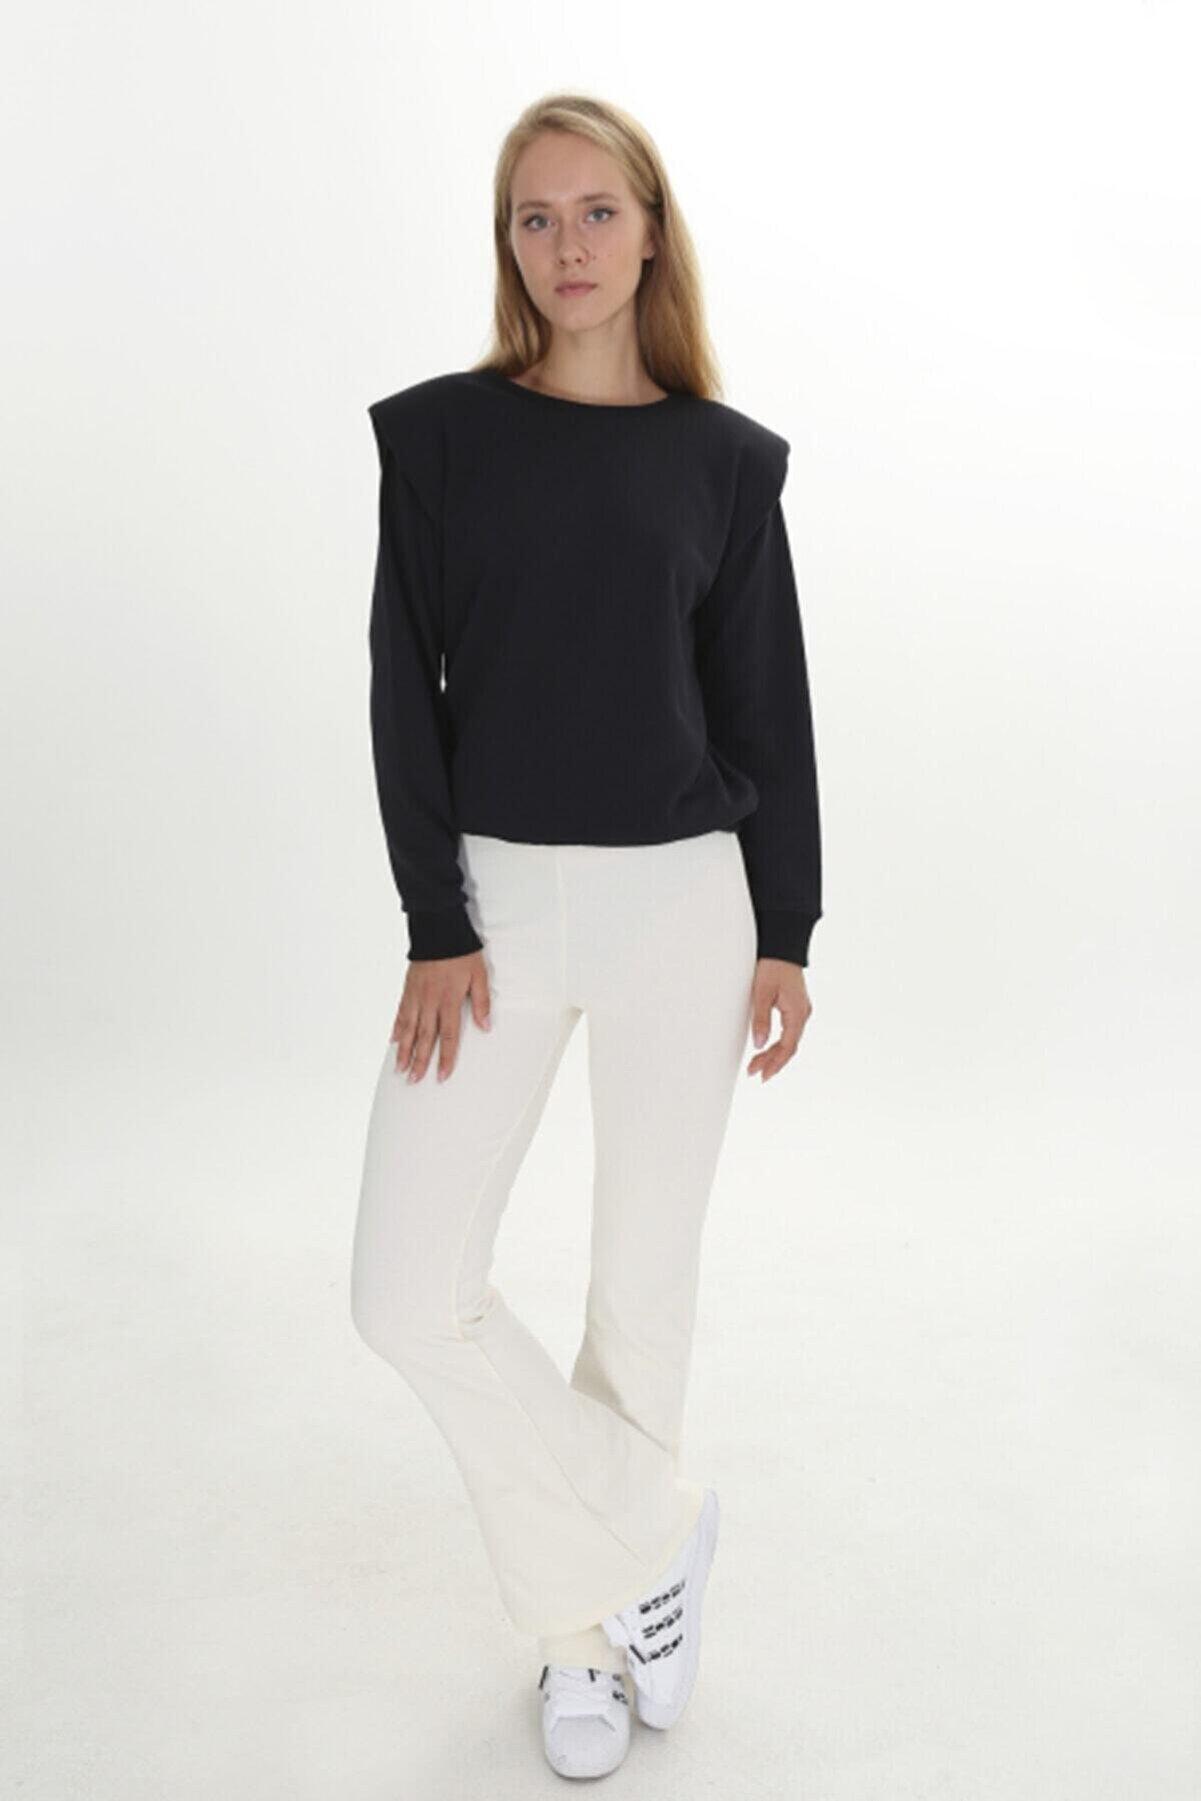 L' Azull Kadın Ekru Paçaları Yan Yırtmaçlı Tayt Pantolon